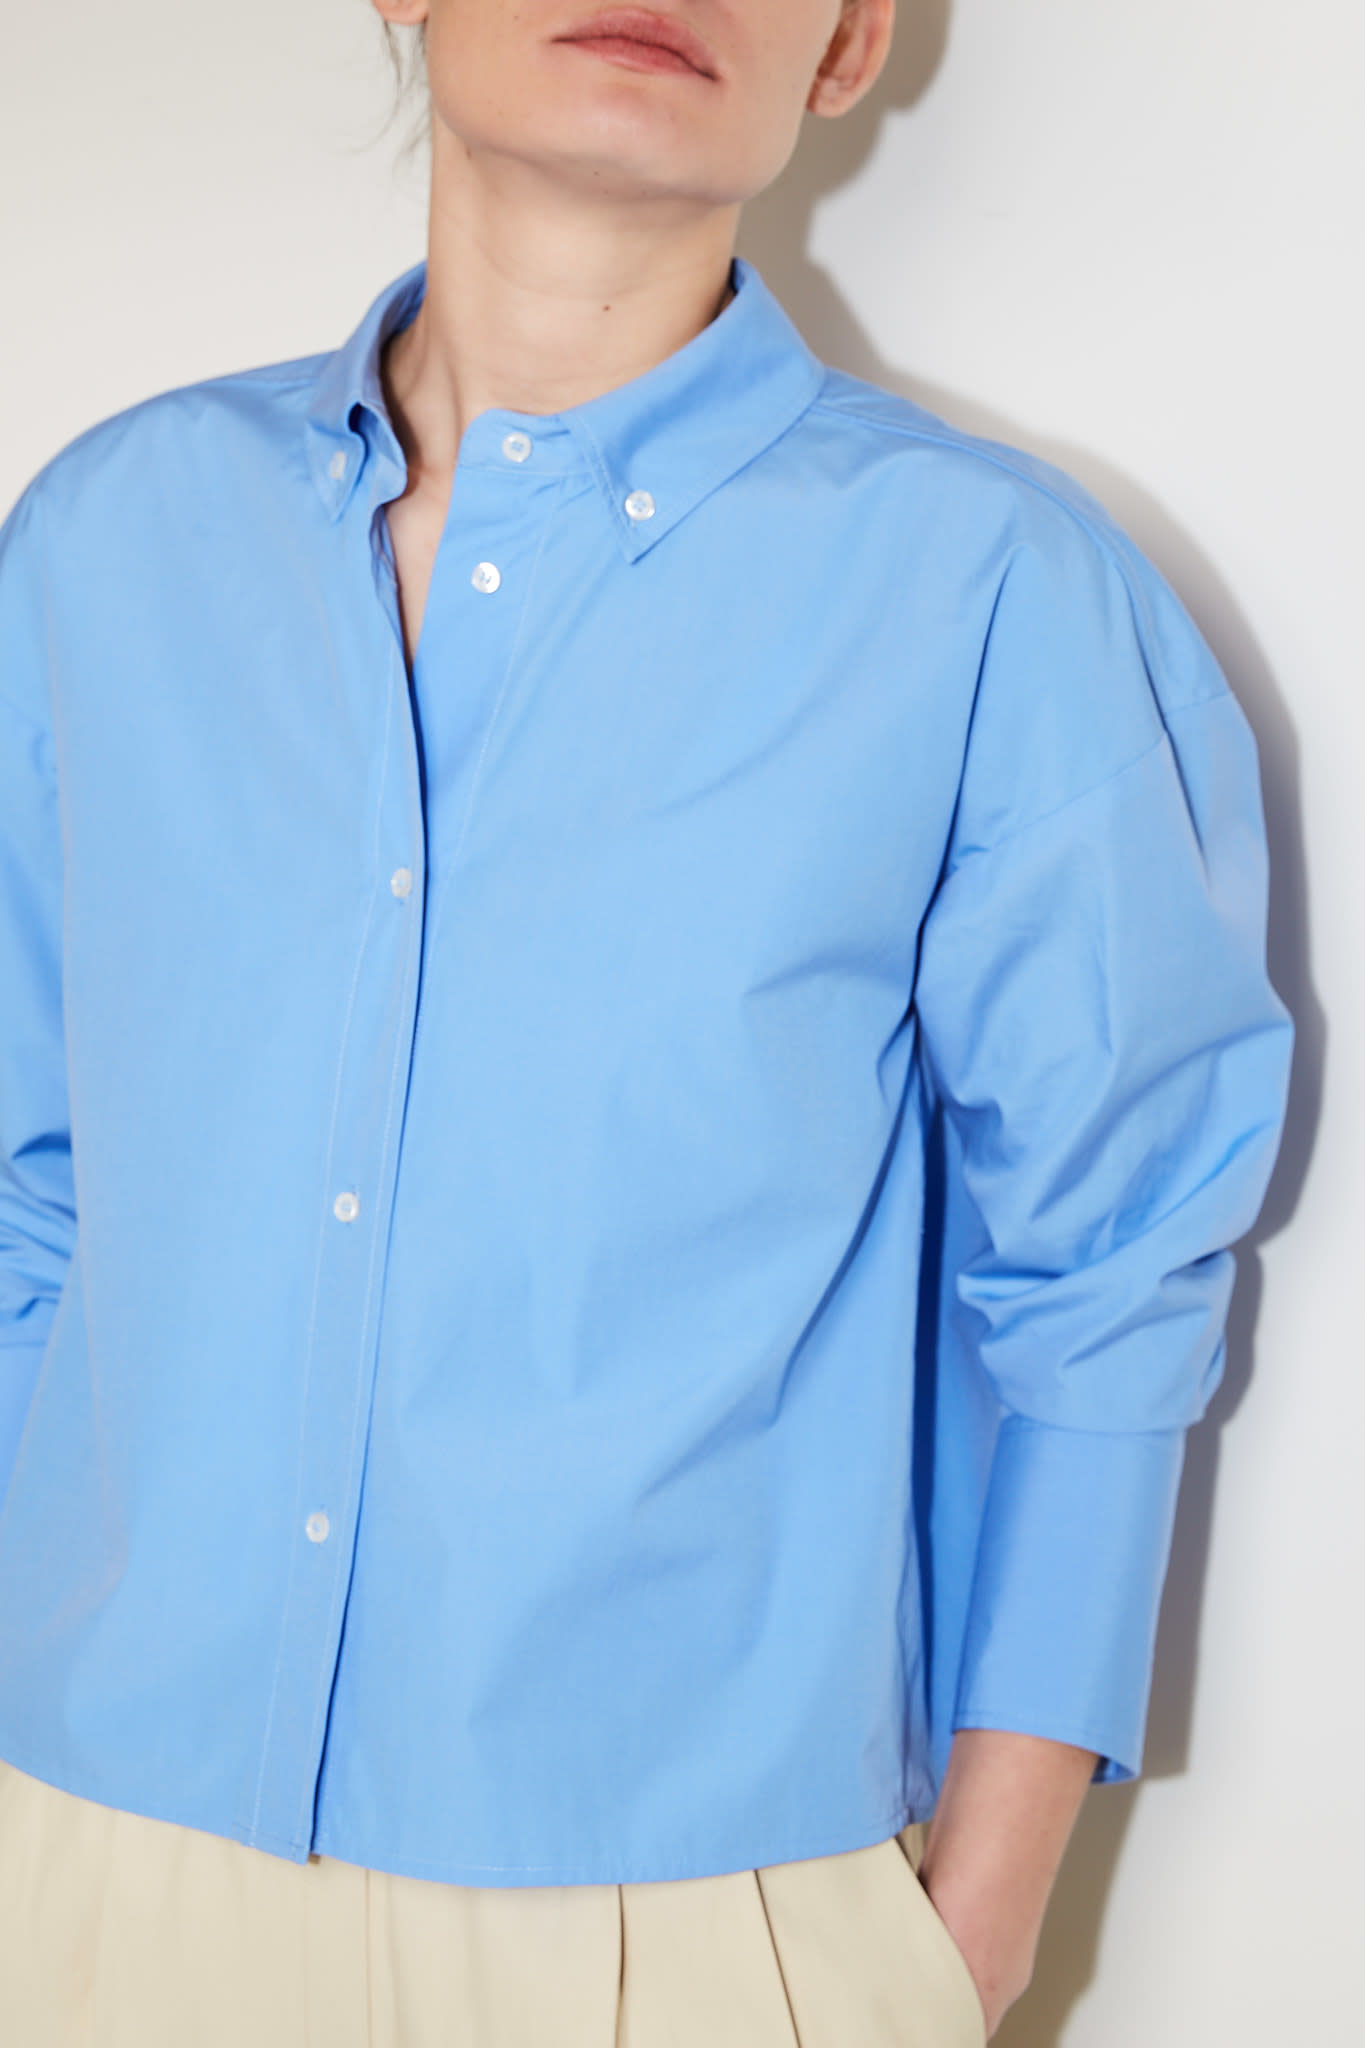 loulou studio - Pulau cotton shirt